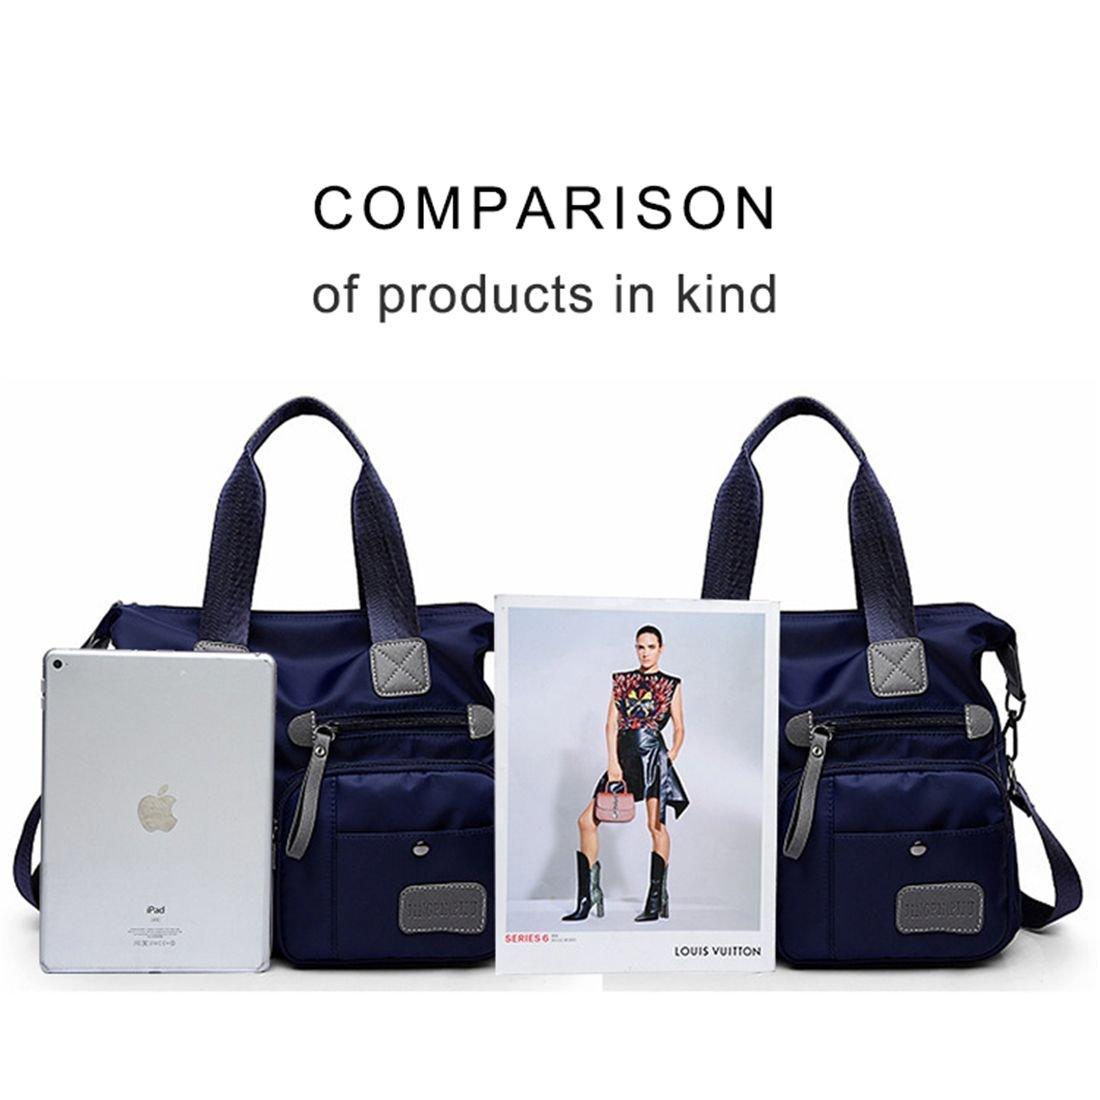 56e4a5b7a0 Amazon.com  REFURBISHHOUSE blue New Ladies Fashion Waterproof Oxford Tote  Bag Casual Nylon Shoulder Bag Mummy Bag Large Capacity Canvas Bag  Shoes